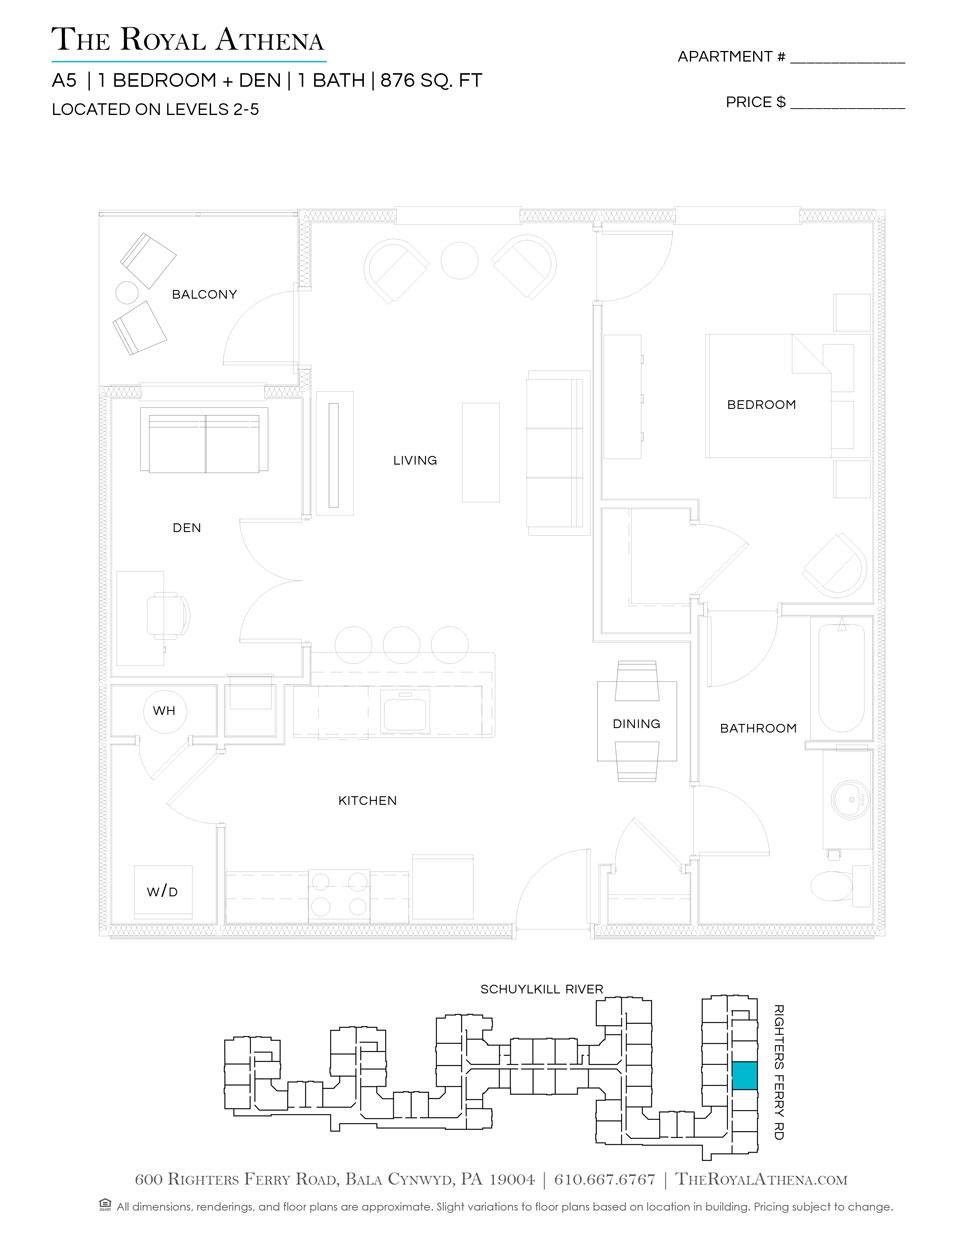 P0659218 a5 2 floorplan